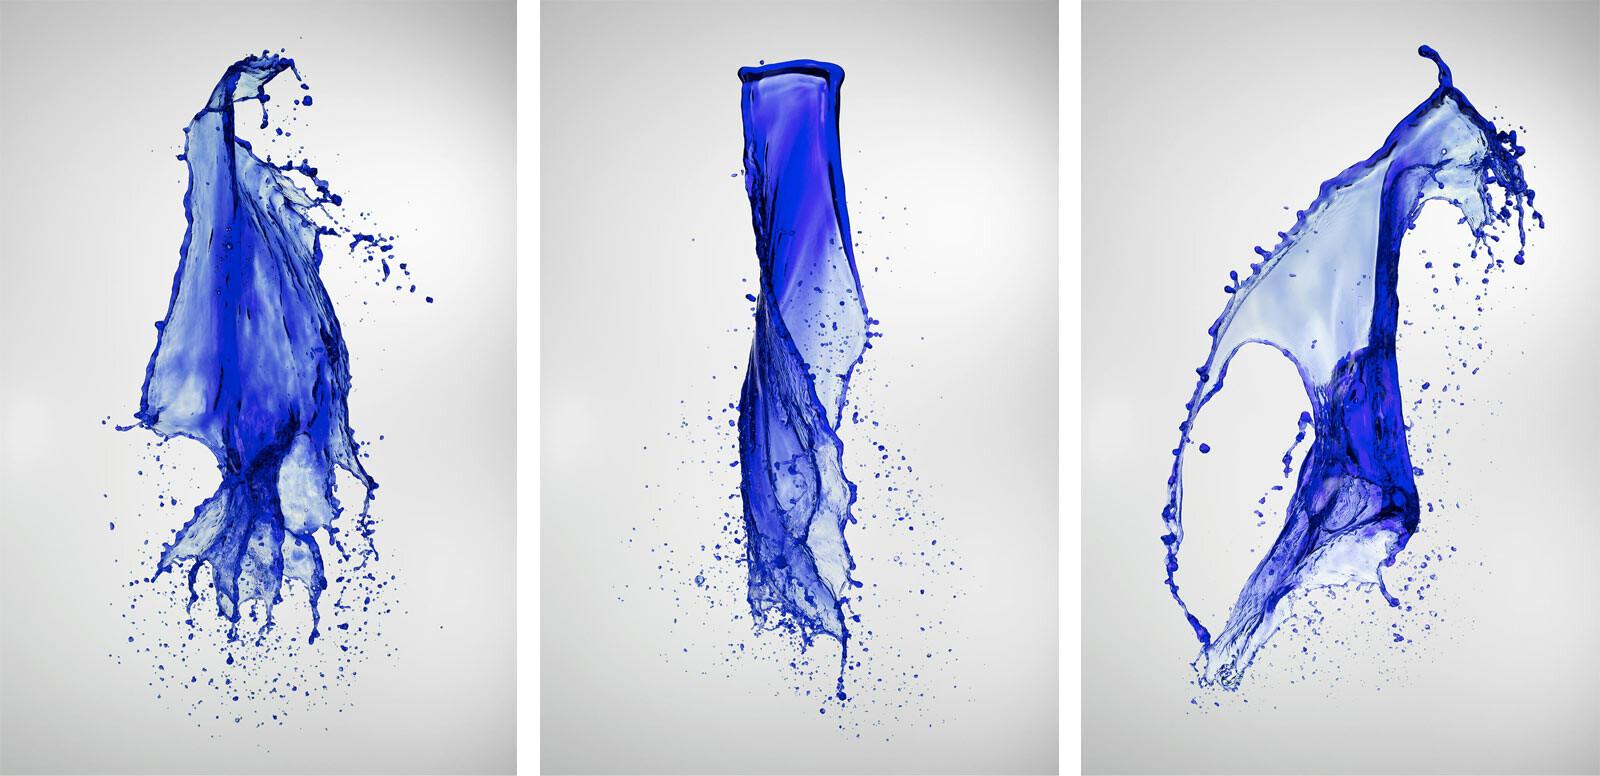 Liquid universe/fall - Thanh-khoa Tran